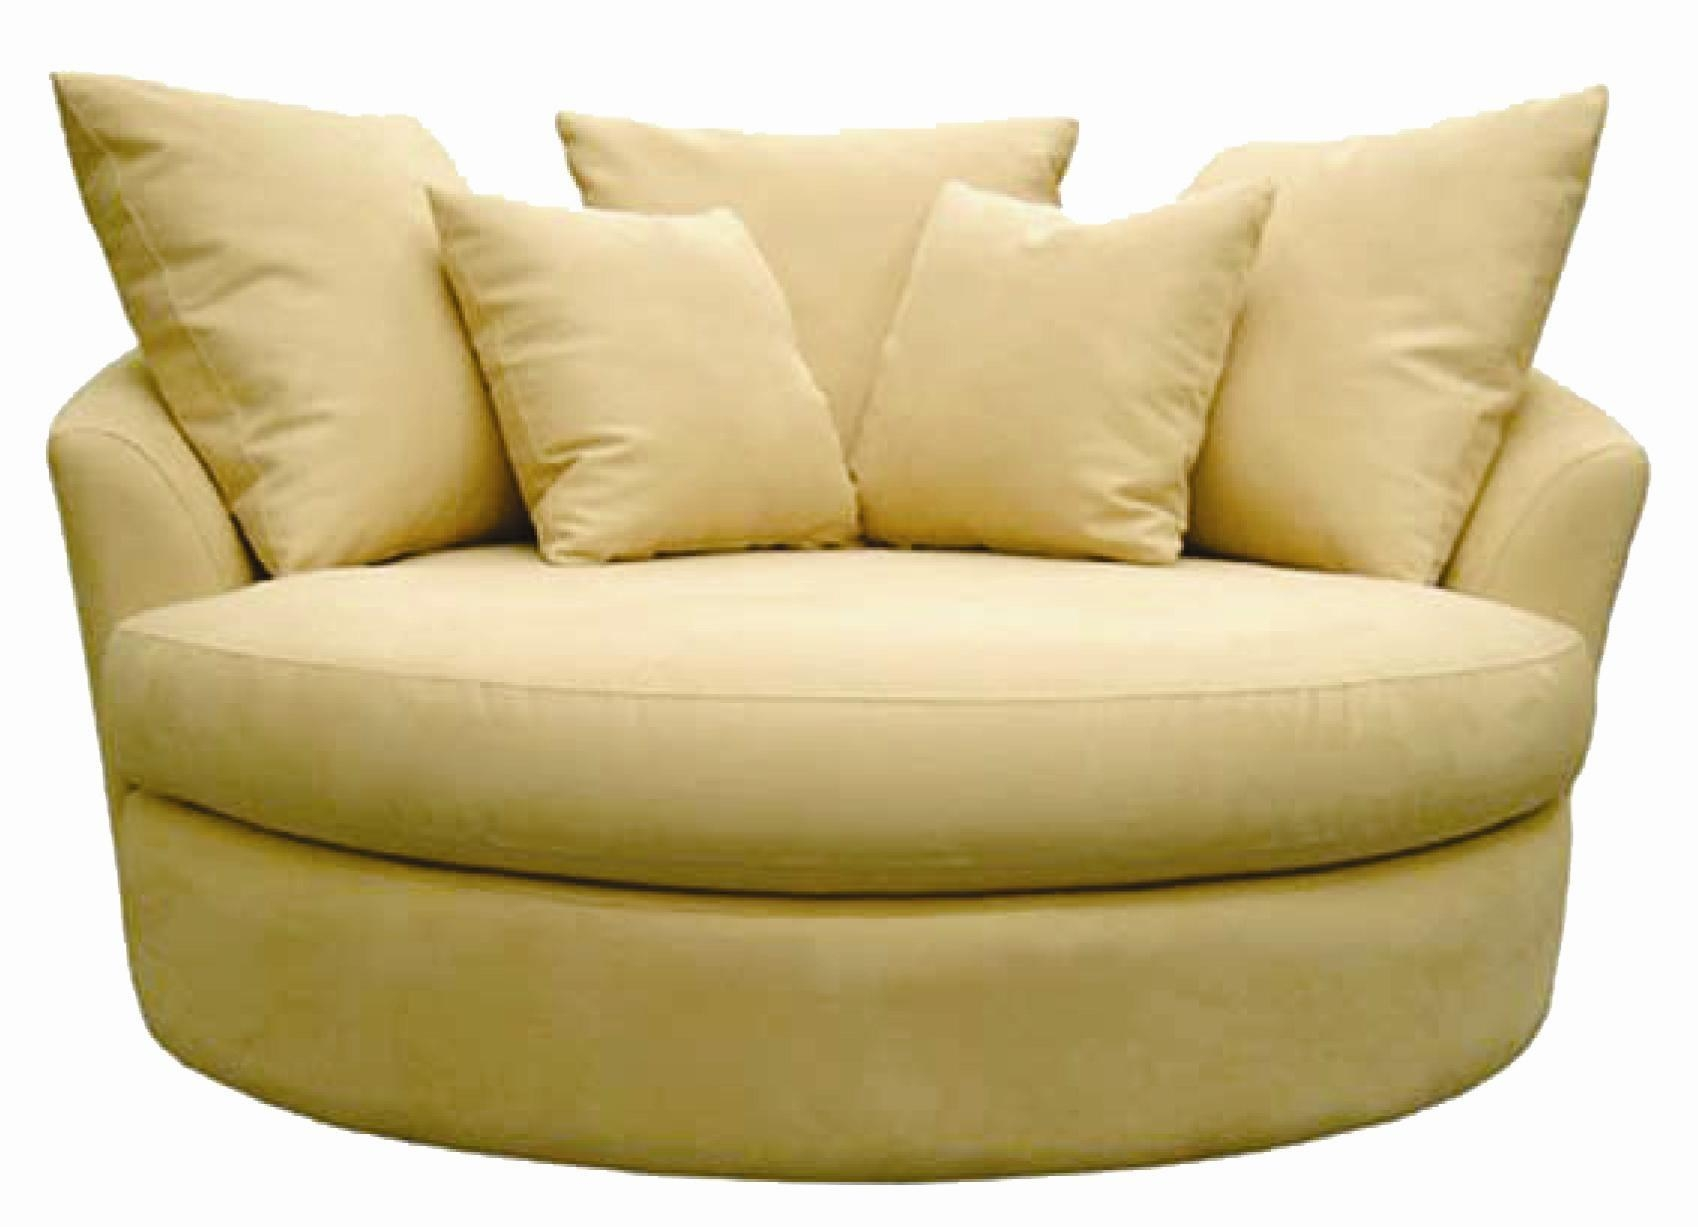 Round Sofa Chair Covers | Tehranmix Decoration Regarding Swivel Sofa Chairs (View 20 of 20)